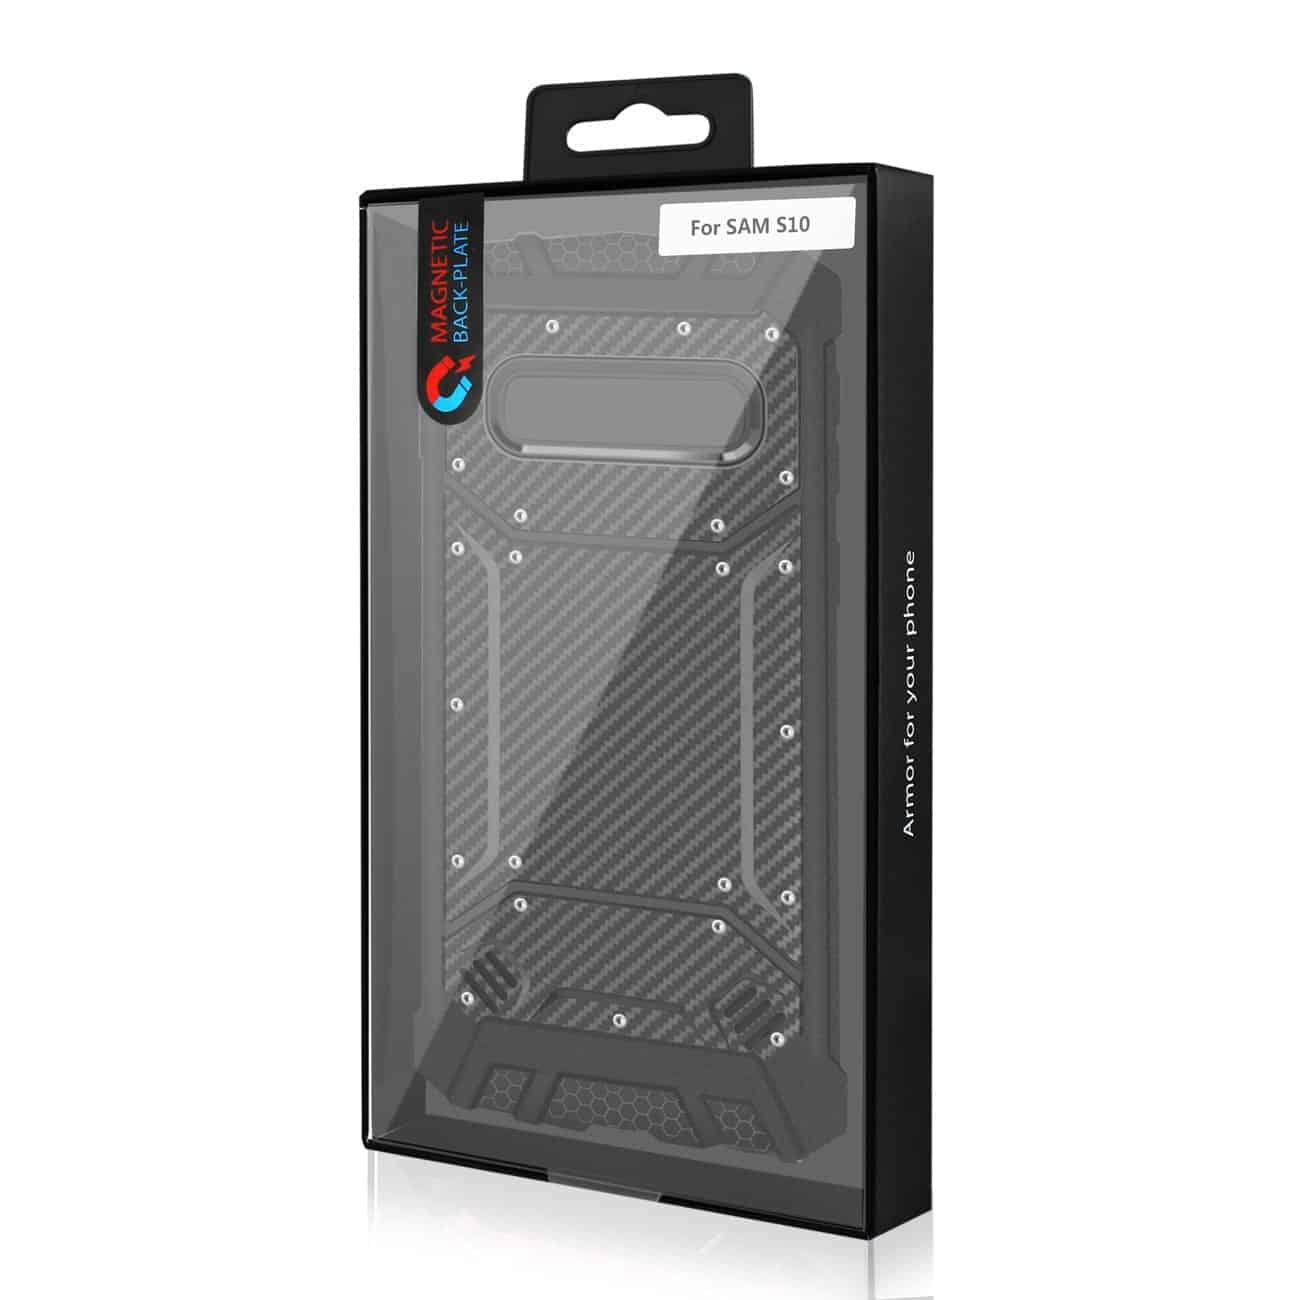 SAMSUNG GALAXY S10 Carbon Fiber Hard-shell Case In Black